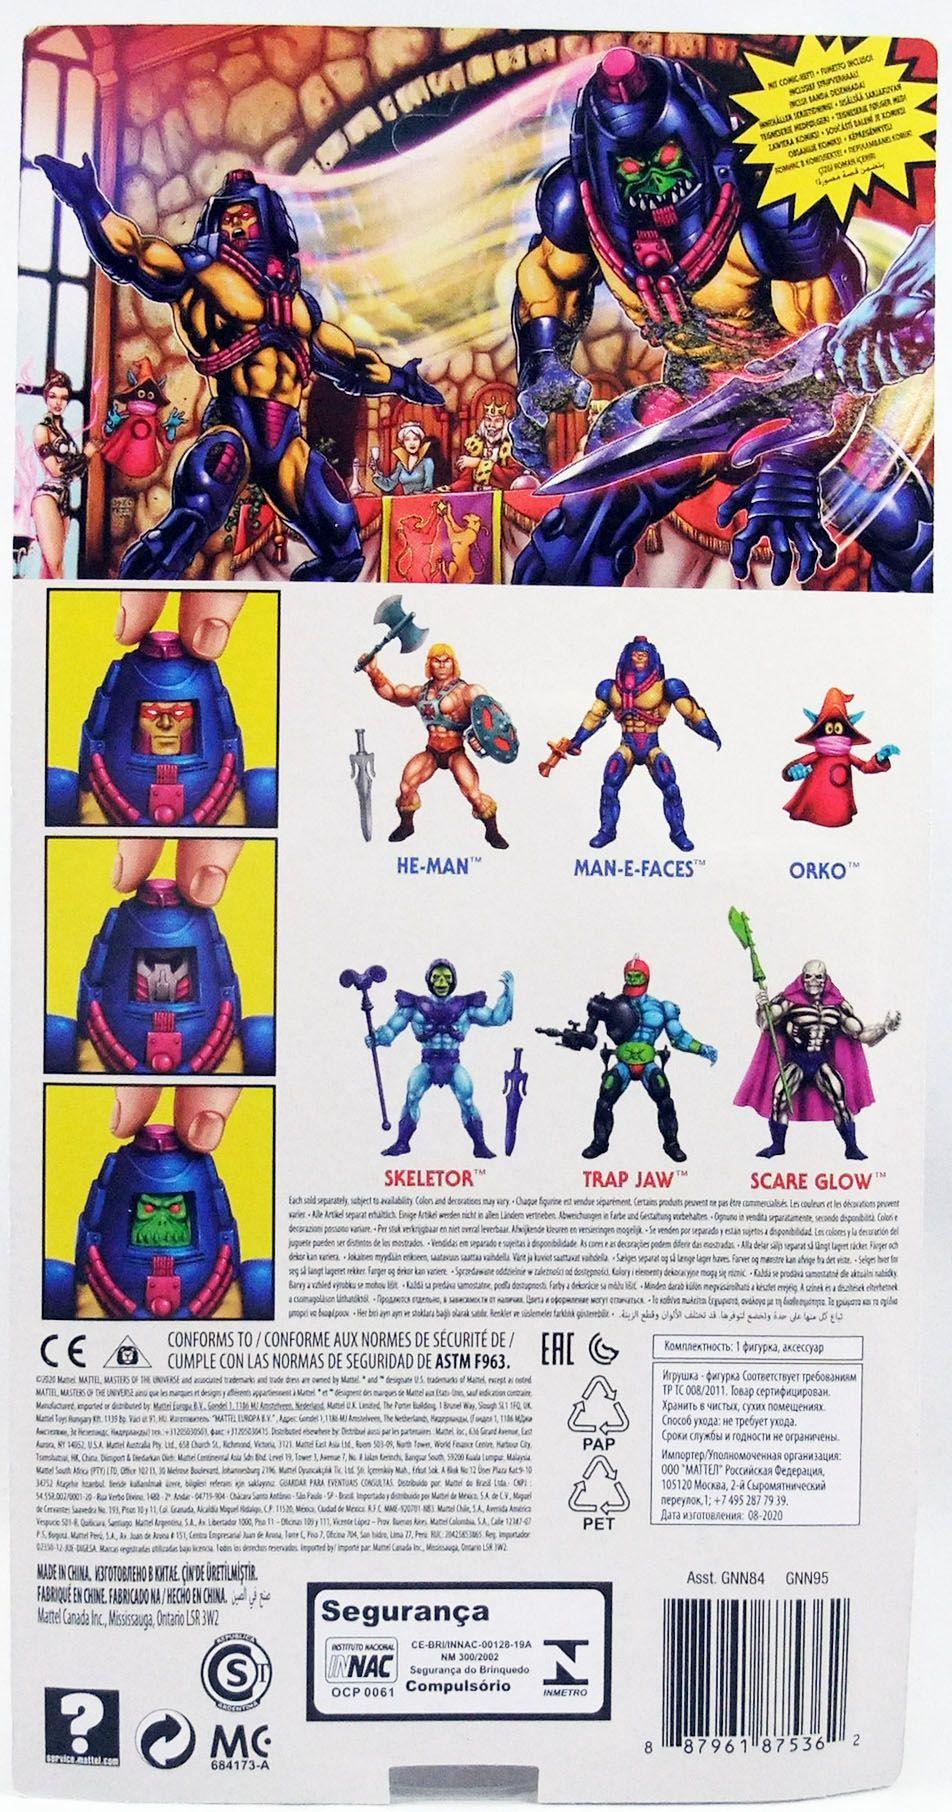 Les Maitres de l\'Univers Origins - Man-E-Faces (Maskor)